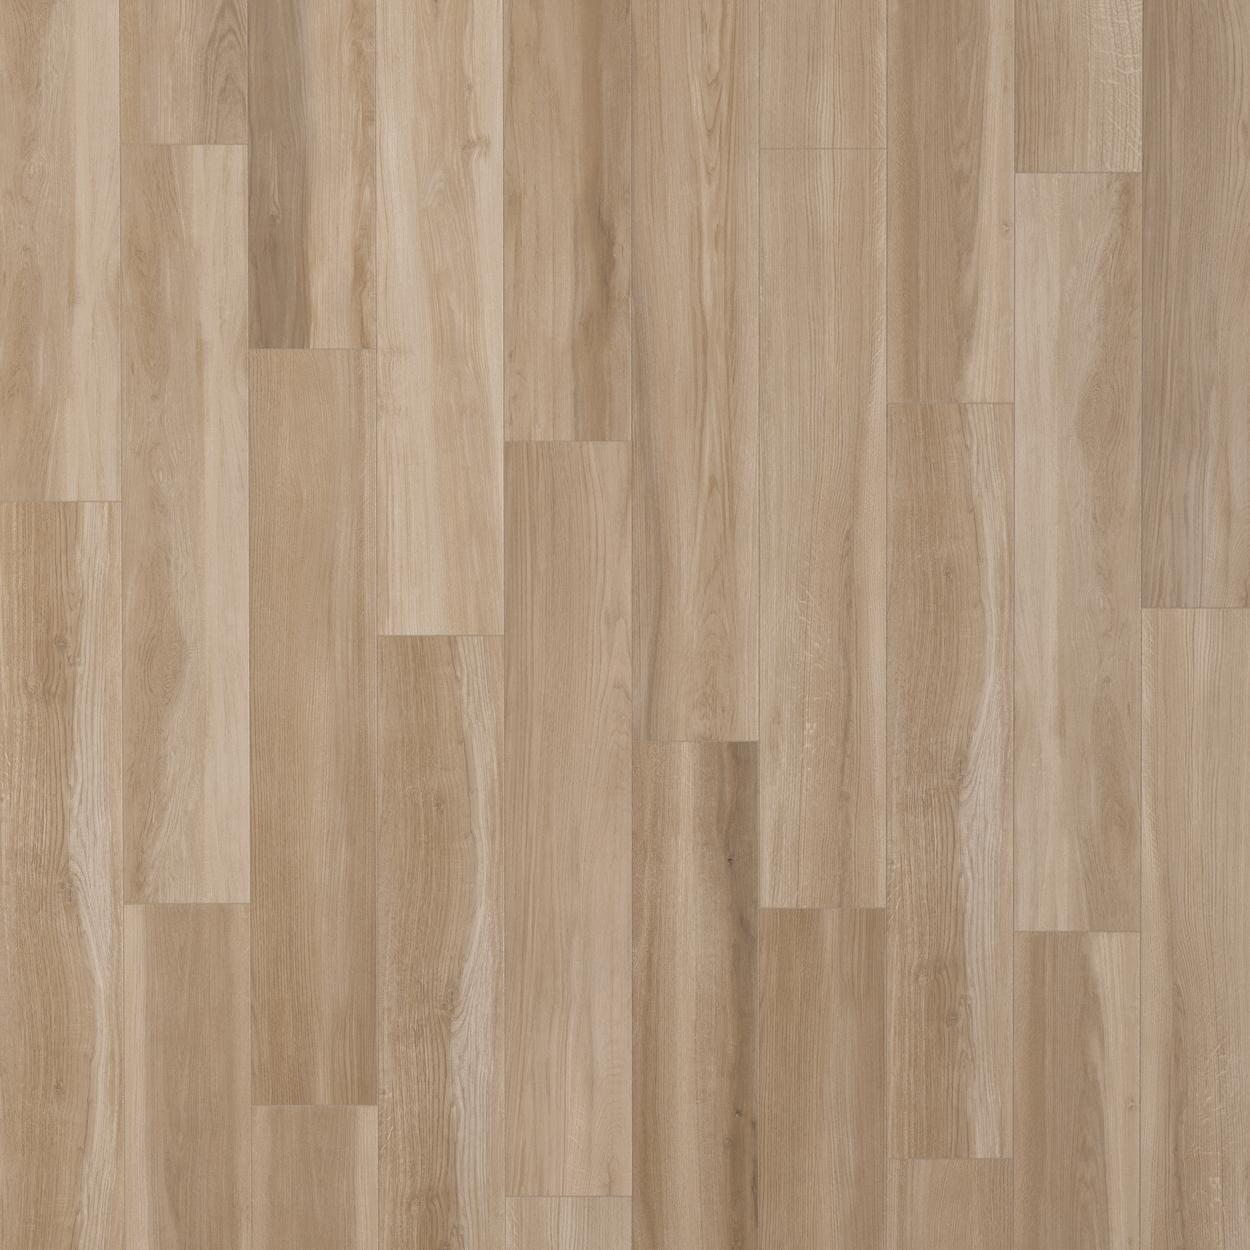 Wooden Aspen Wood Look Tile